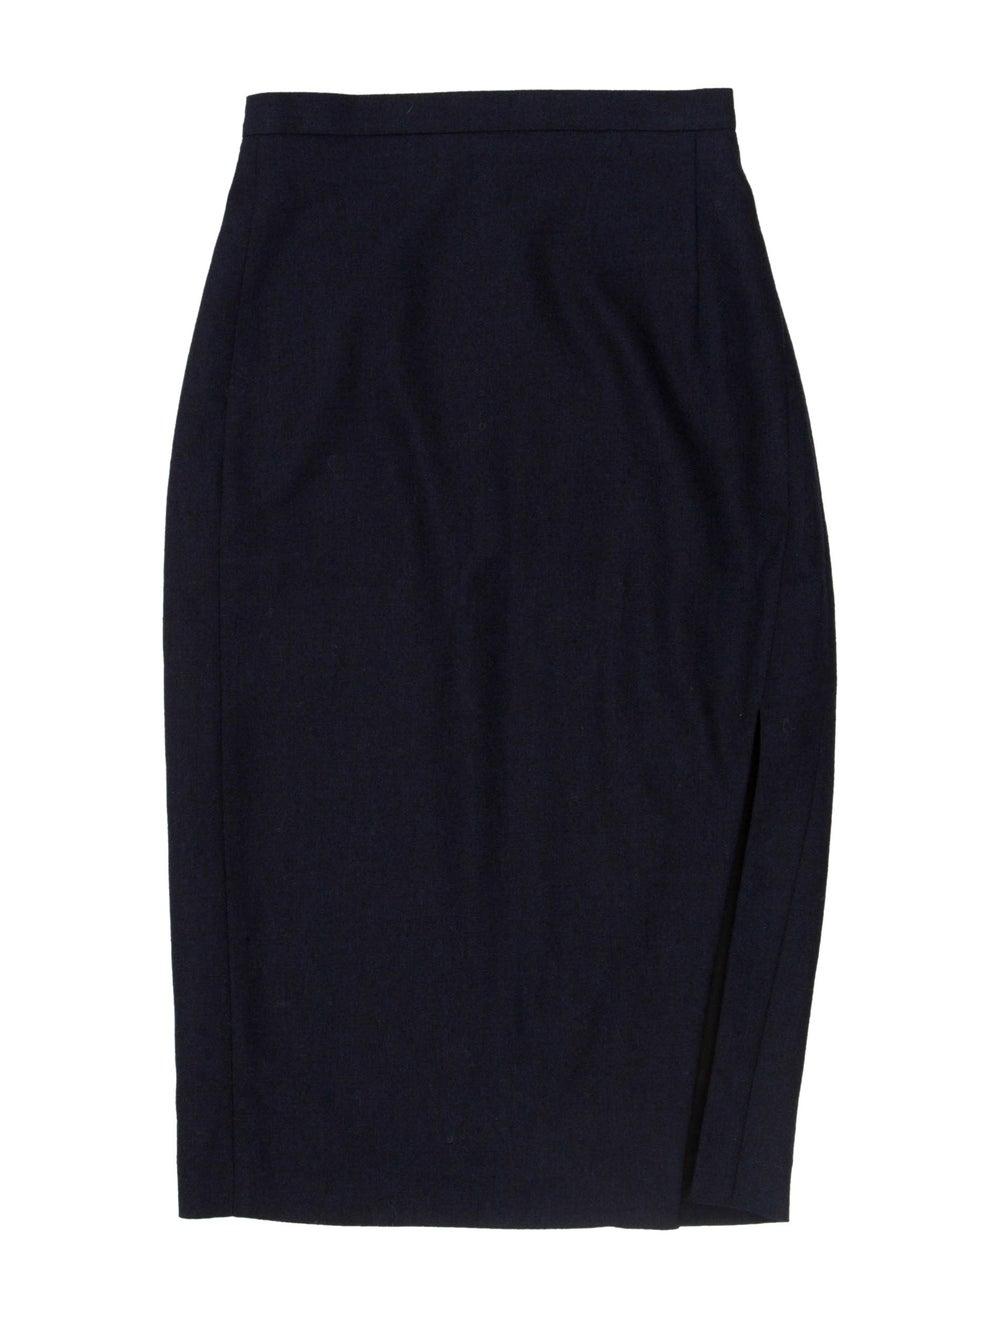 Altuzarra Midi Skirt Navy - image 1